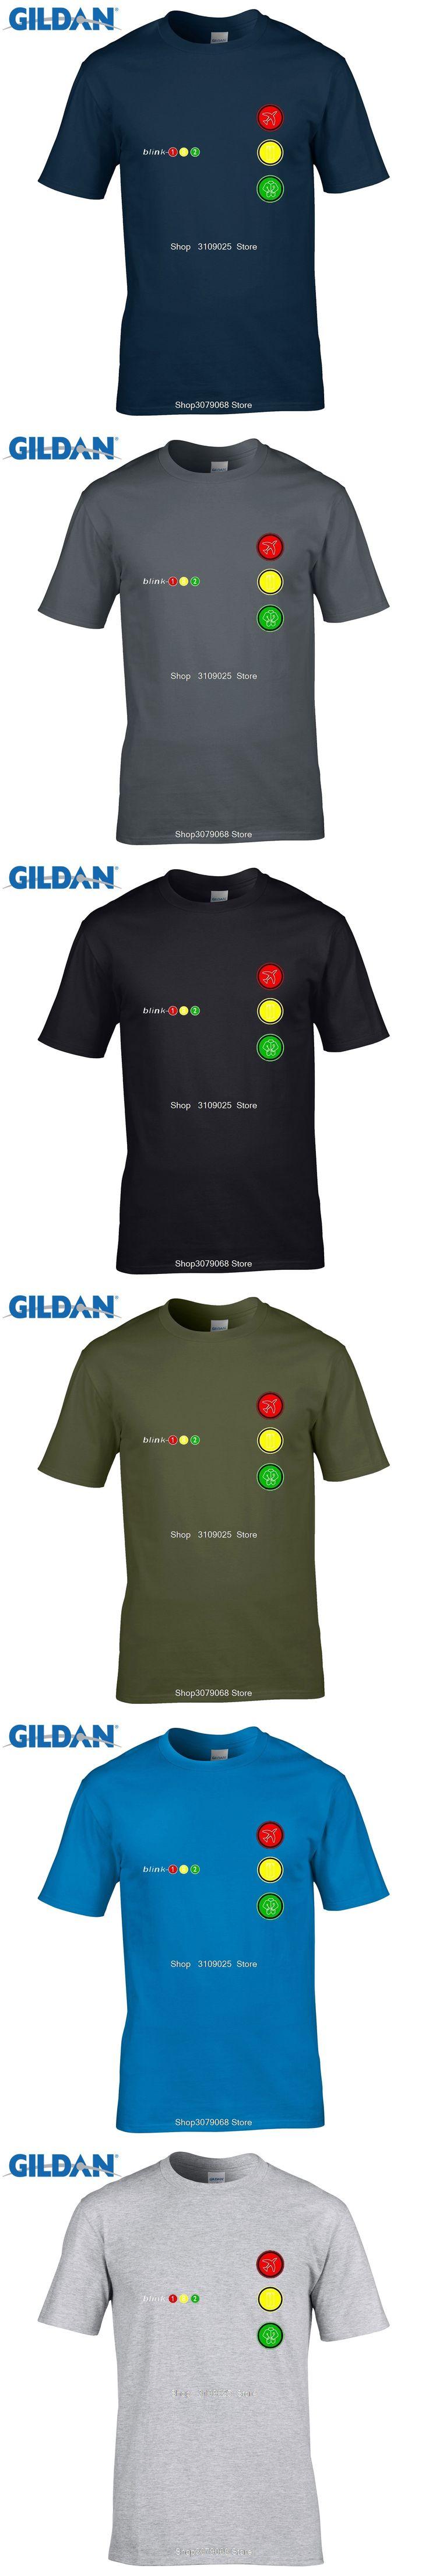 GILDAN customised t-shirts  Rock Tee Shirts Blink 182 T-shirt Youths Oversize Short Sleeved Top Tees Men Big Size